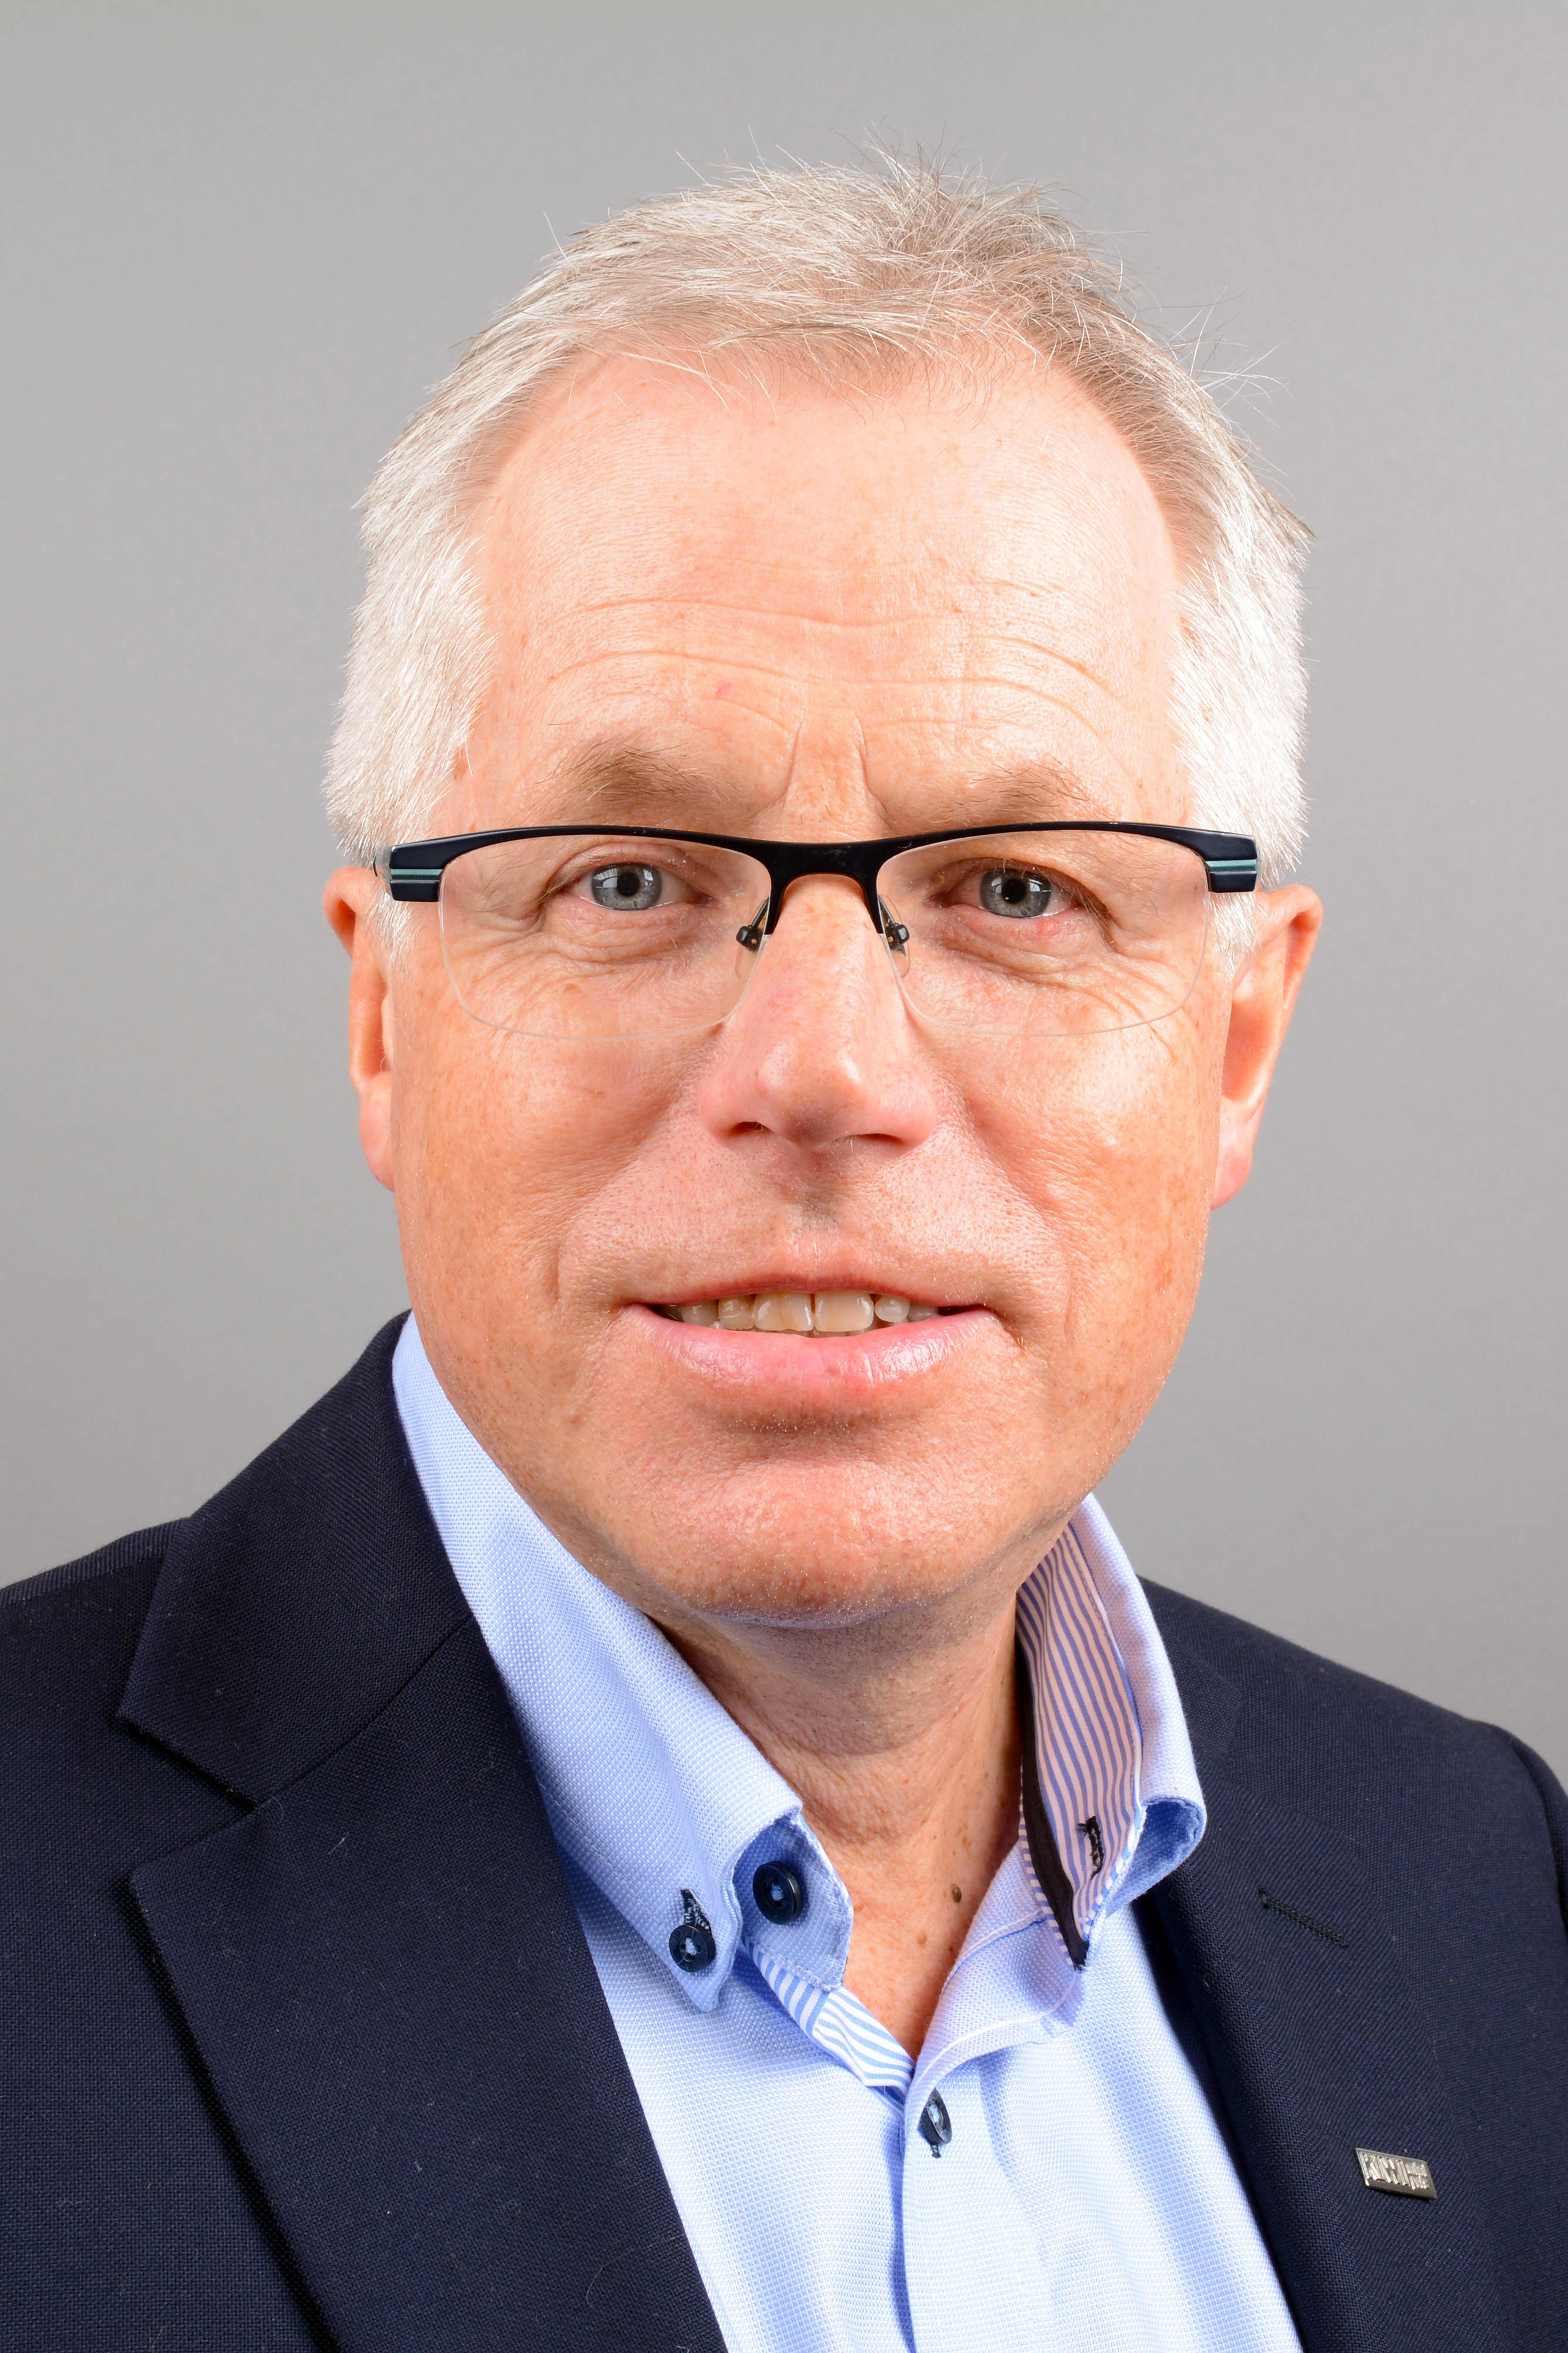 KIWI-sjef Jan Paul Bjørkøy